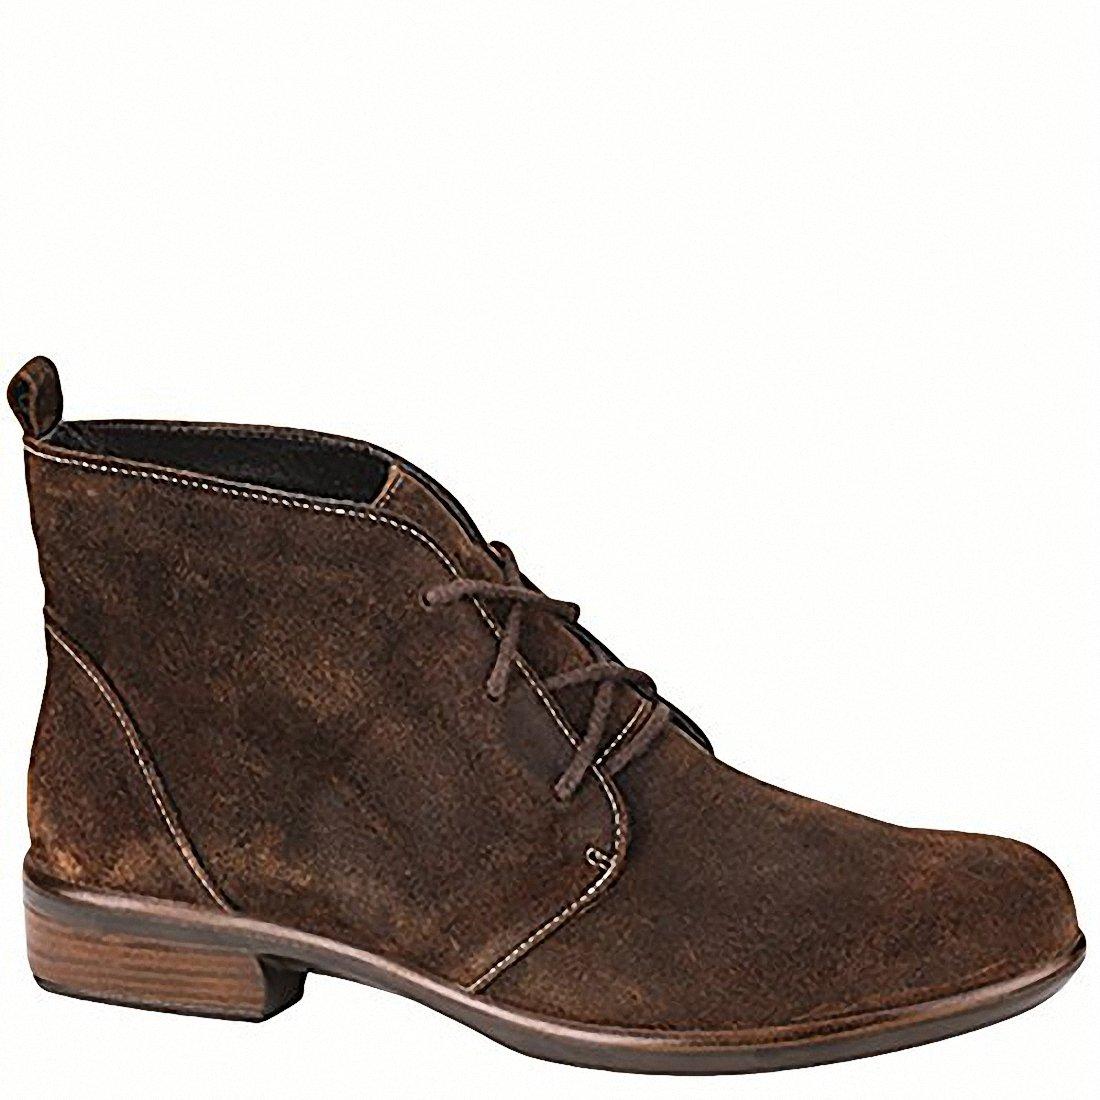 NAOT Levanto Aura Women Boots, Seal Brown Suede,Size - 41